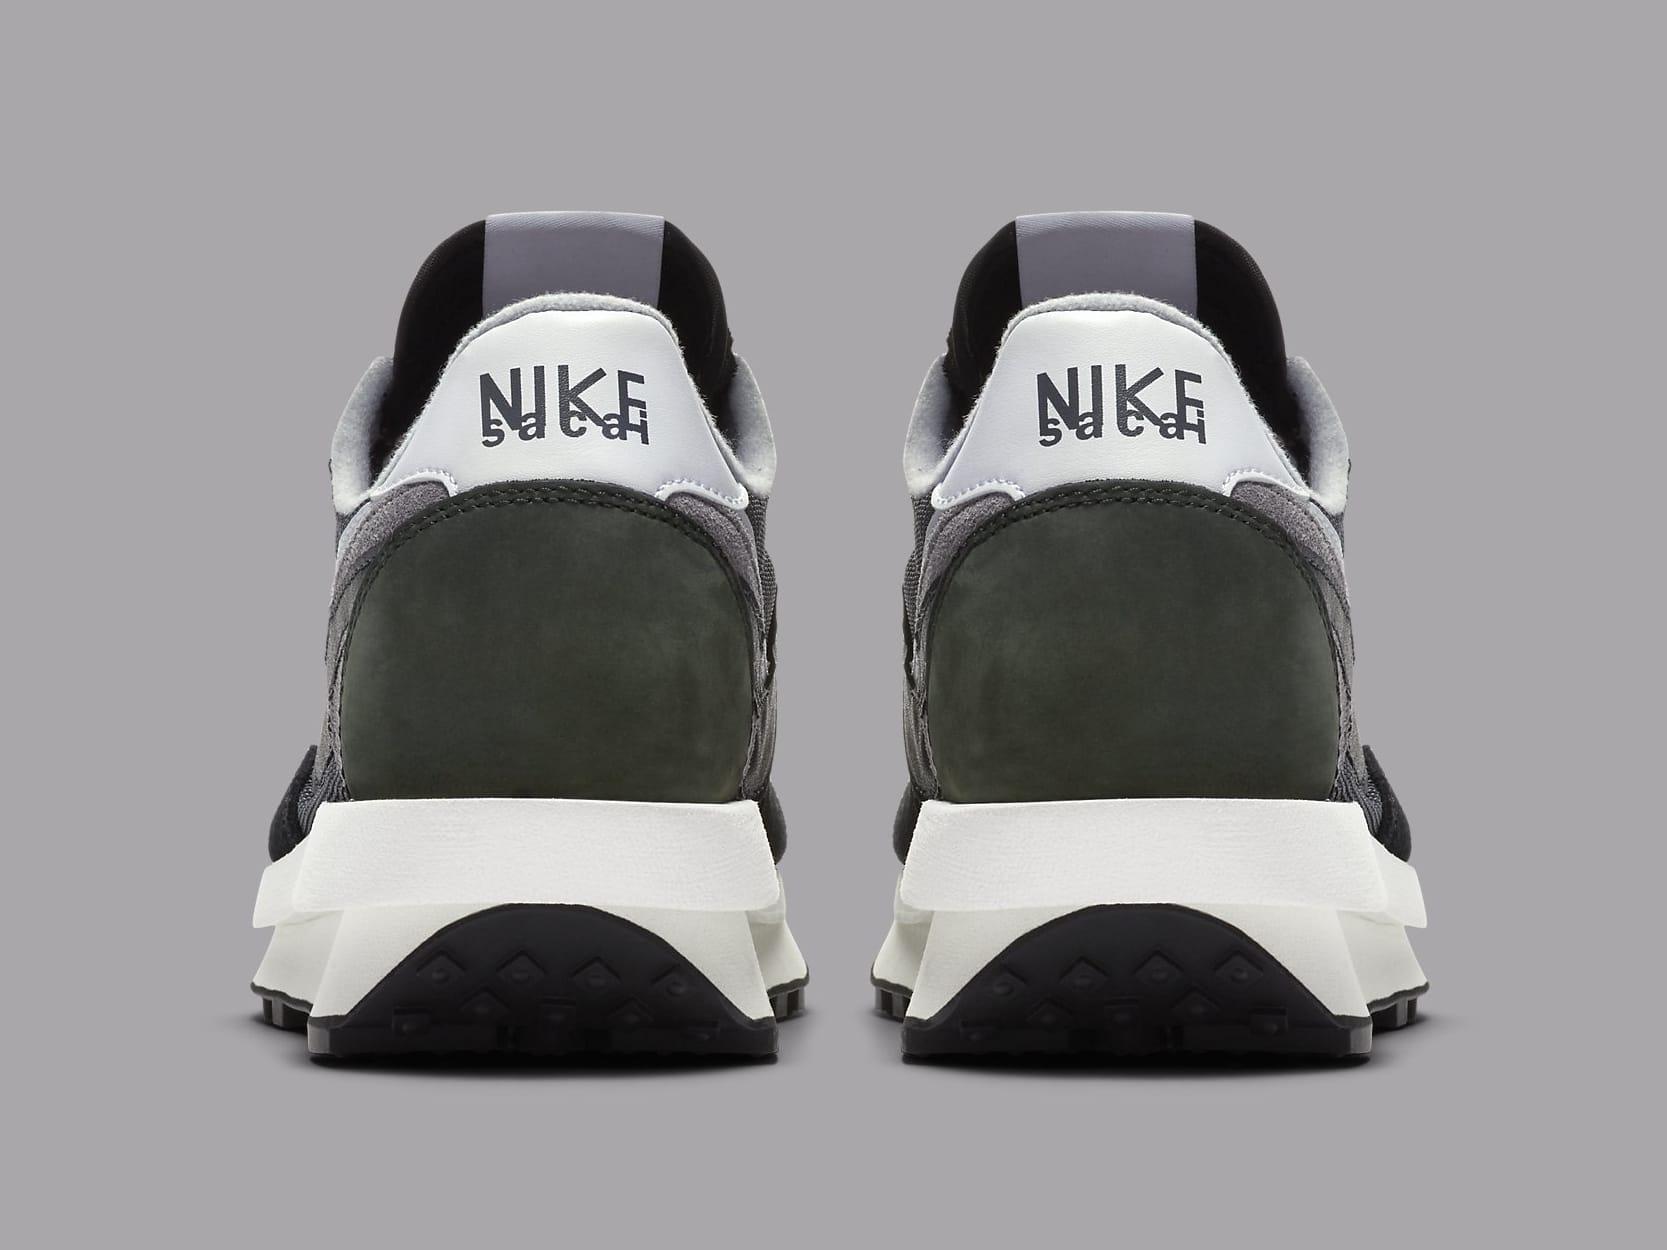 Sacai x Nike LDWaffle Black Anthracite Release Date BV0073-001 Heel